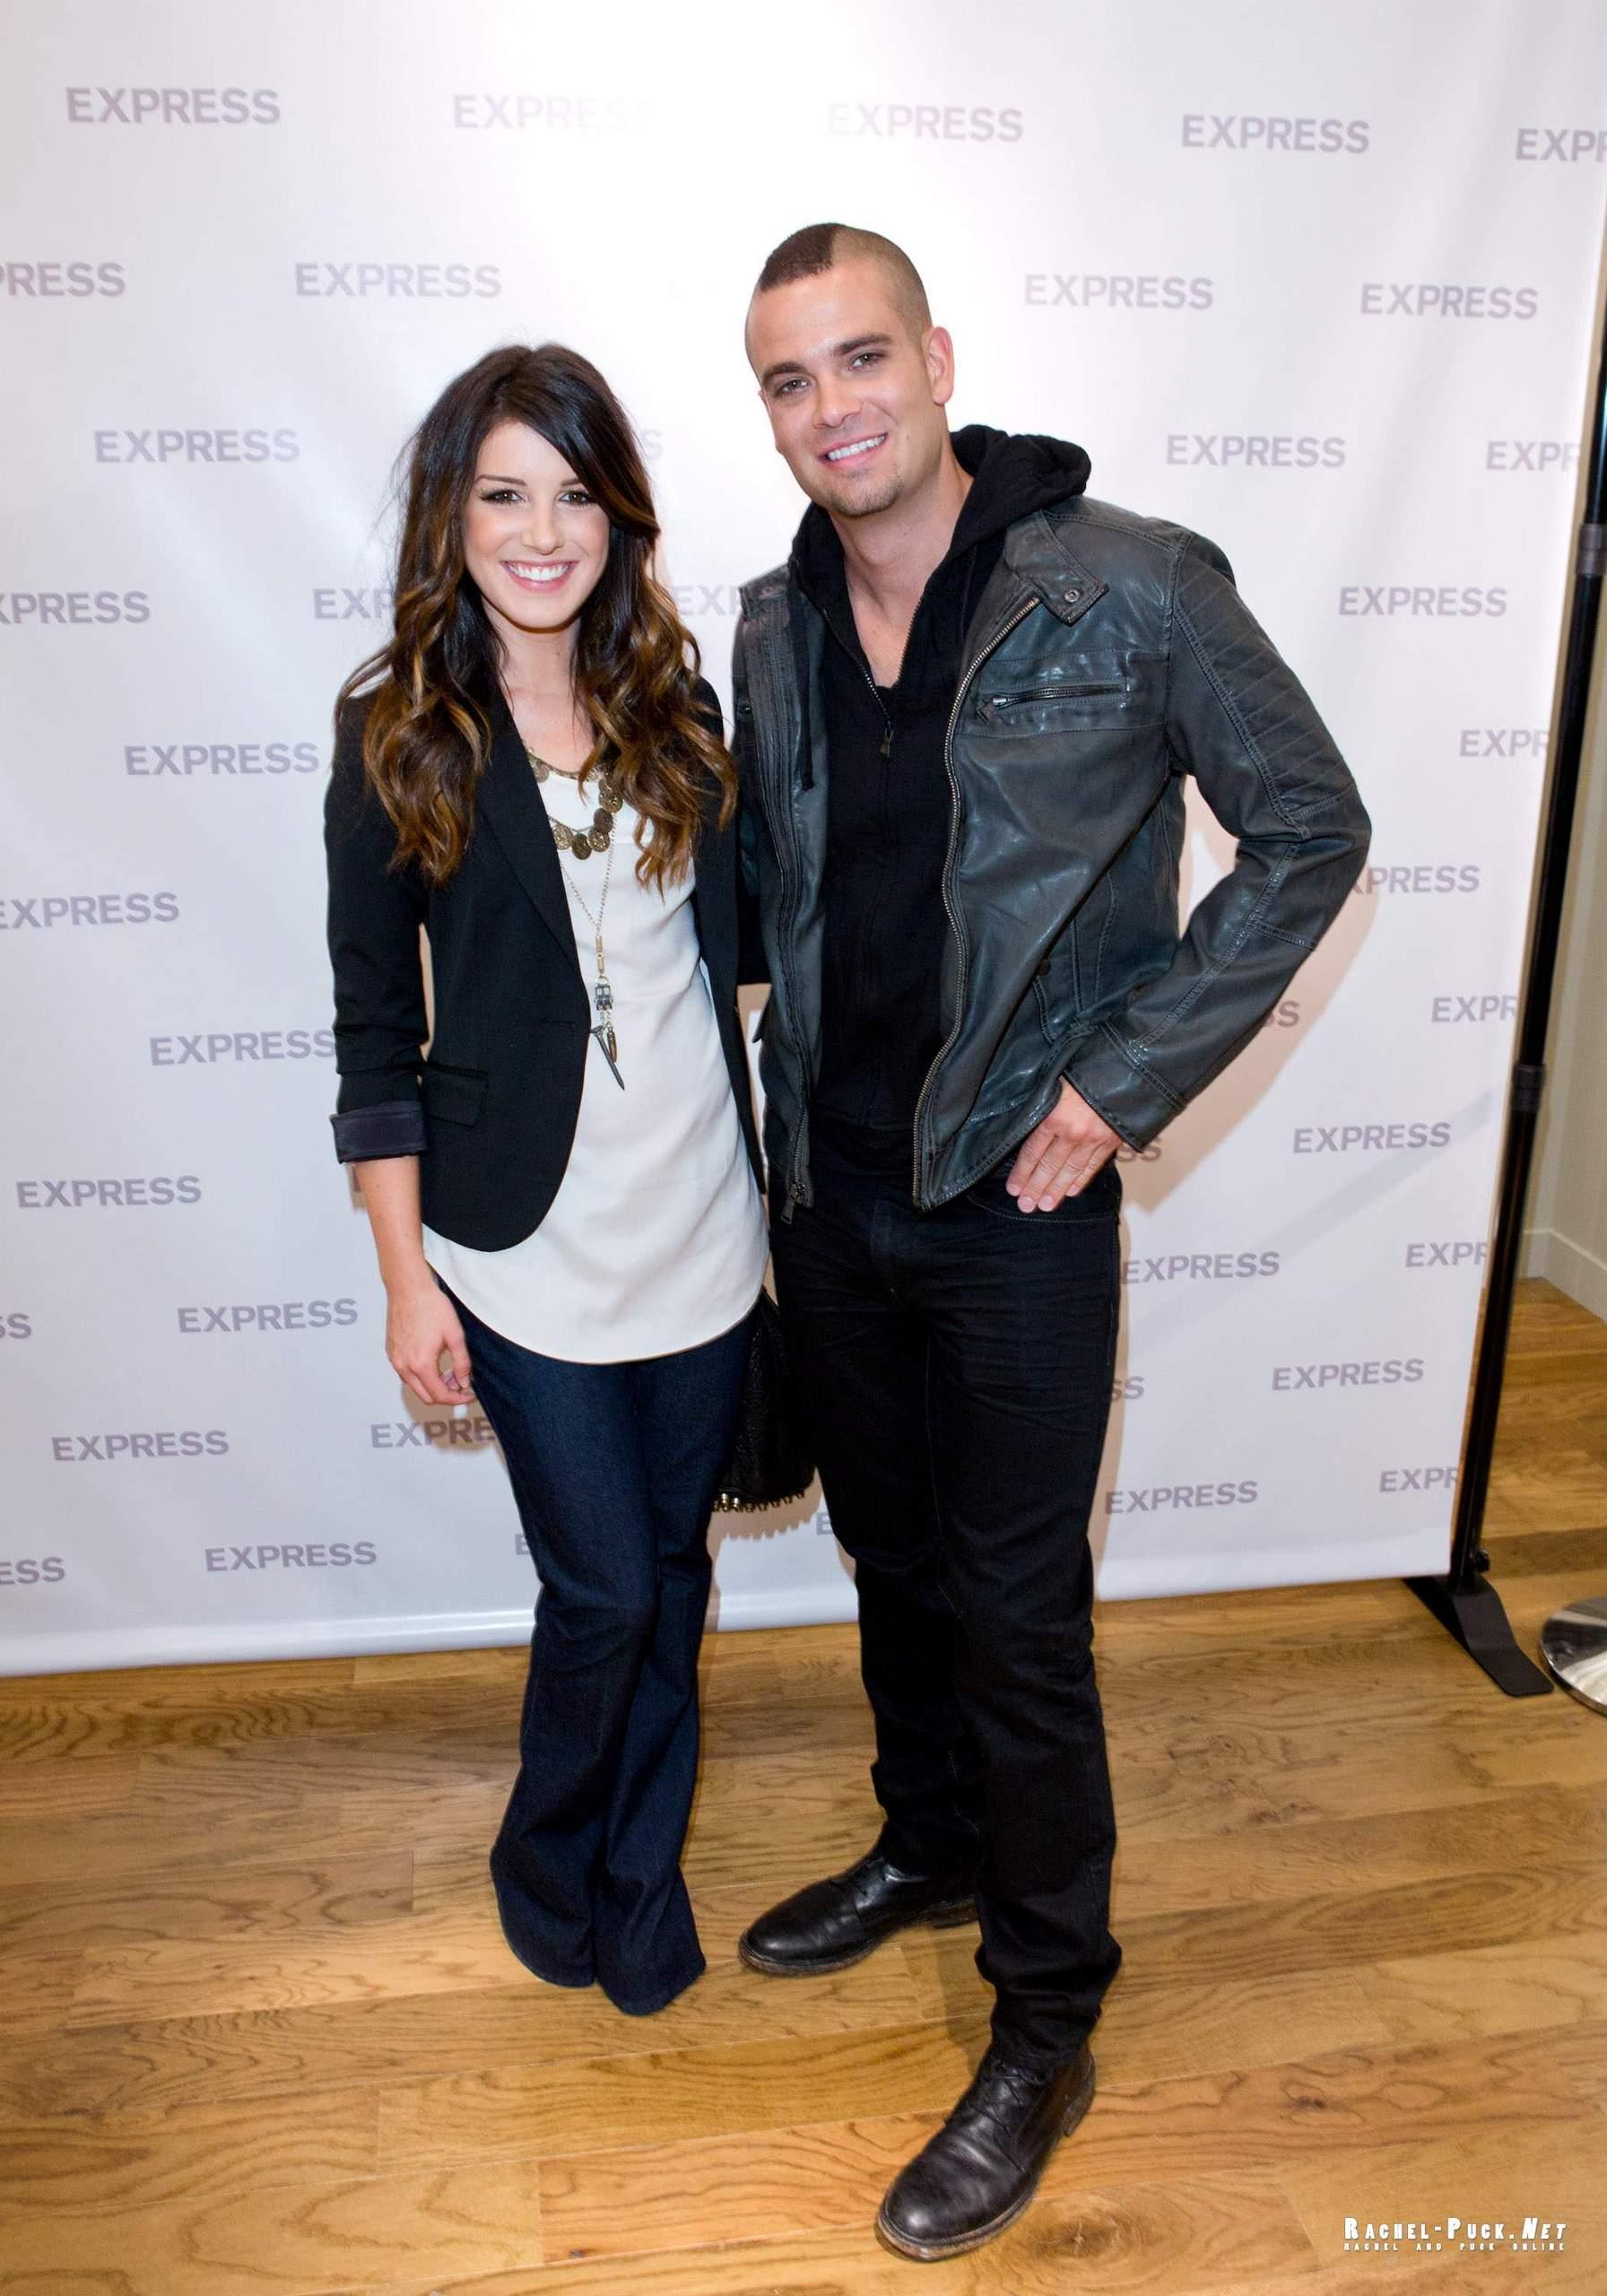 Mark Salling and Shenae Grimes